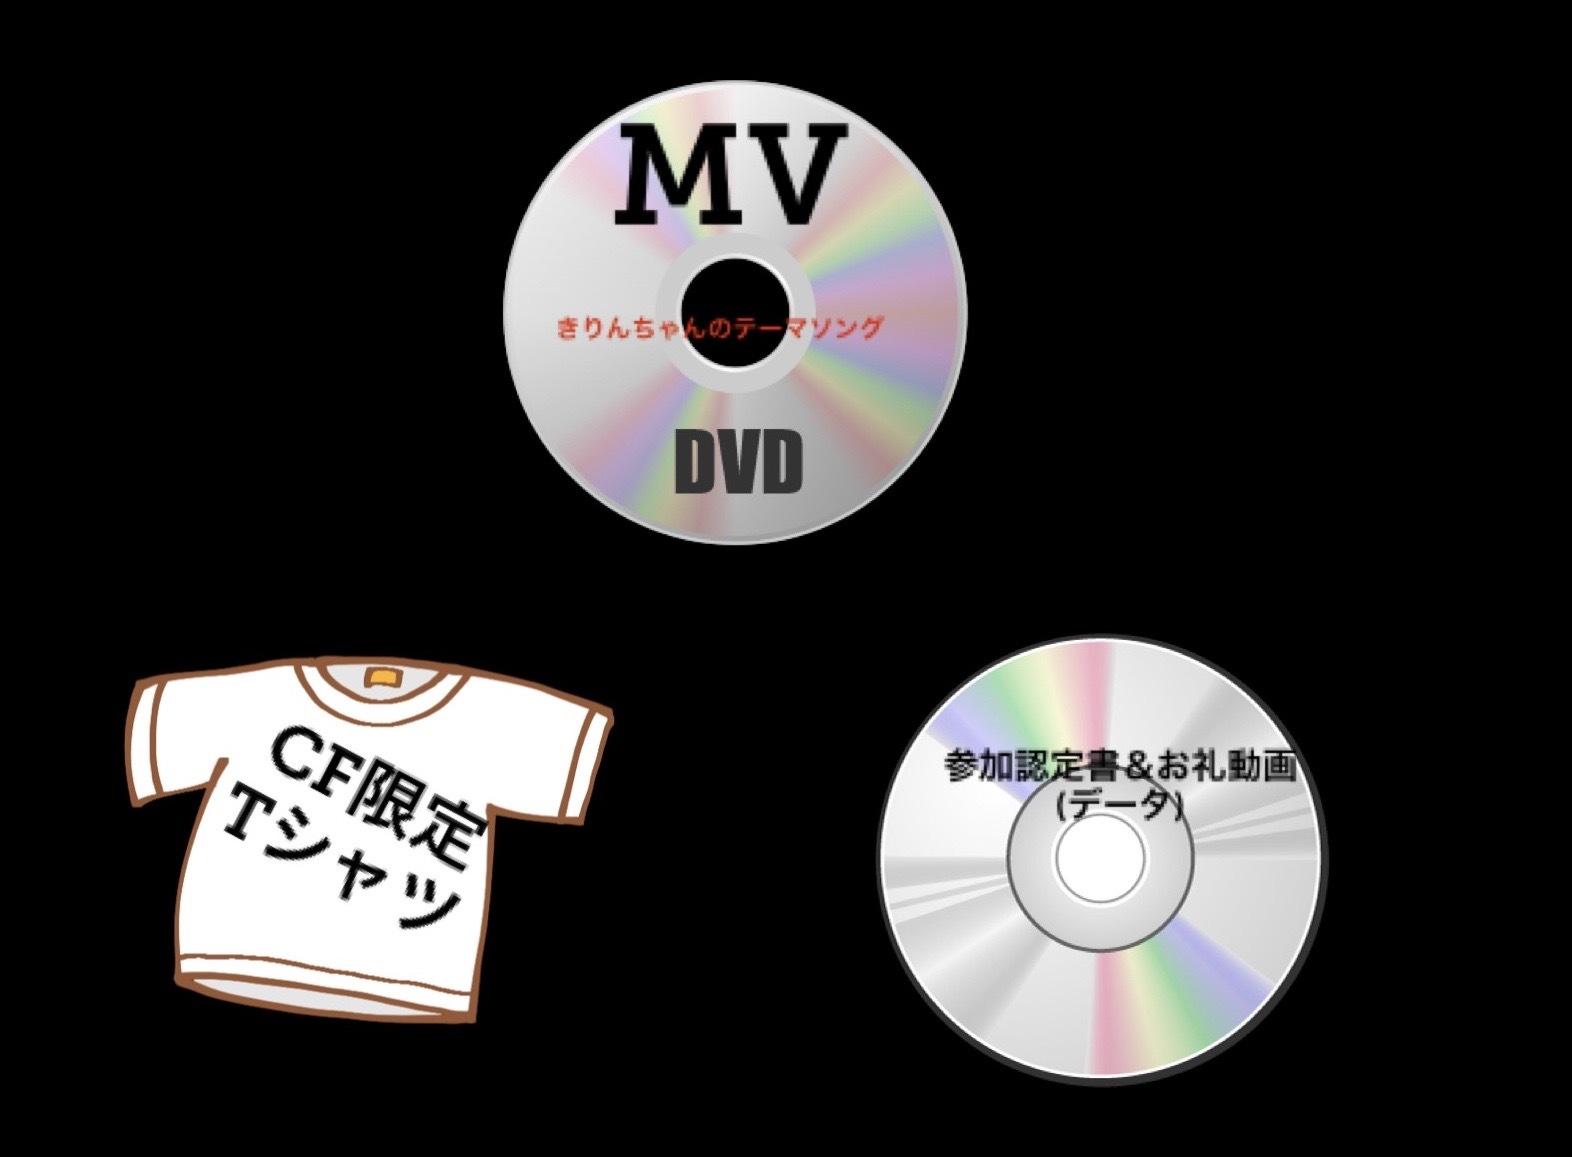 <CF限定MV完成記念Tシャツ&MV『きりんちゃんのテーマソング』プラン>